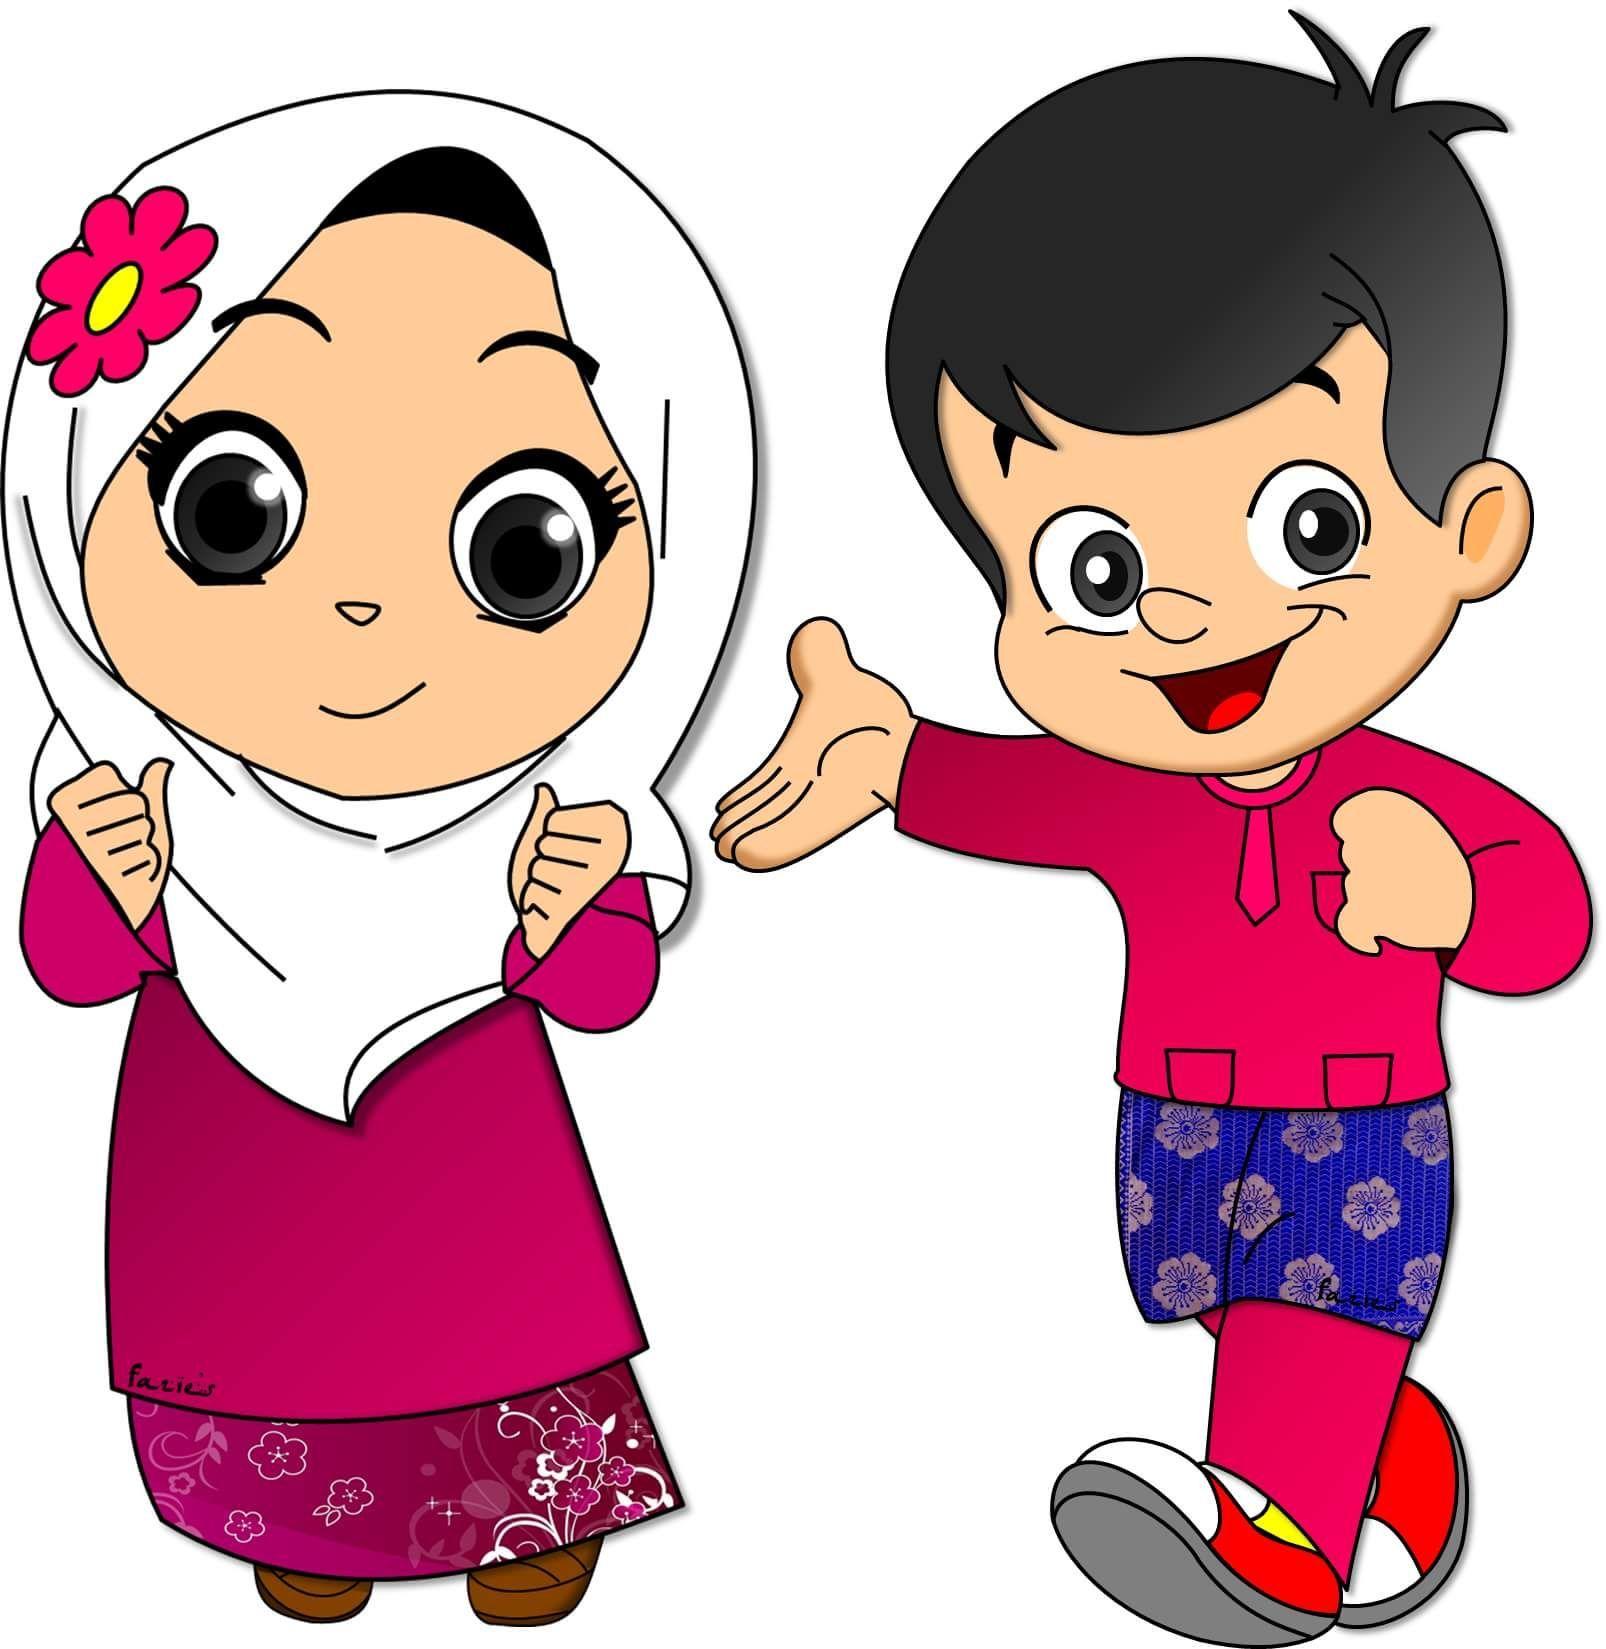 Gambar Muslimah Kartun Ibu Menyusui Anak - Muslim Cartoon ...